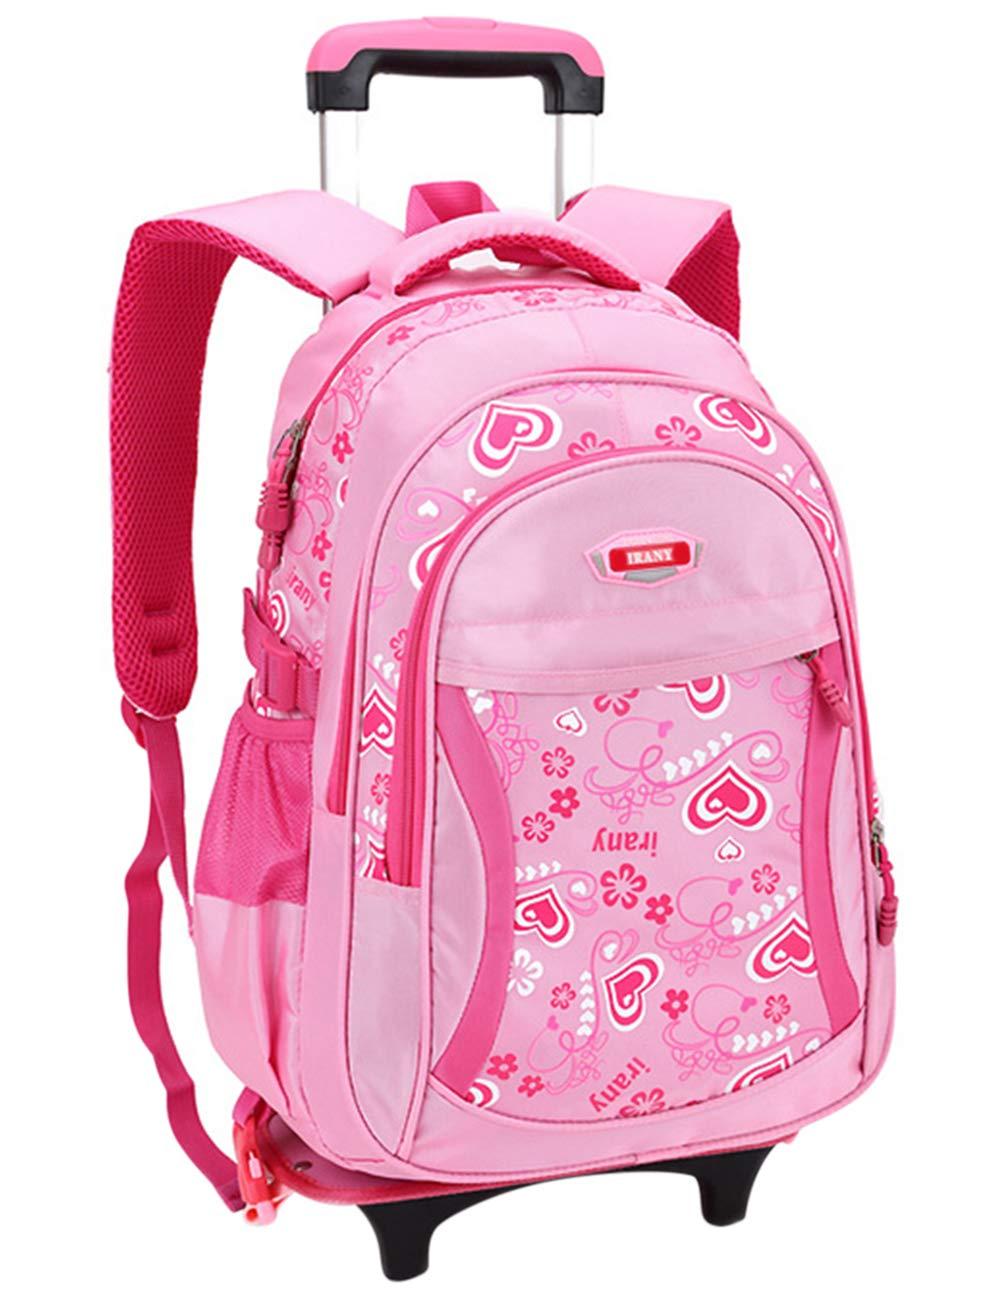 9706  Pink One_Size Backpack Shoulder Bag Trolley School Bag Travel Bag Rucksack Kid Teenager Zhhmeiruian